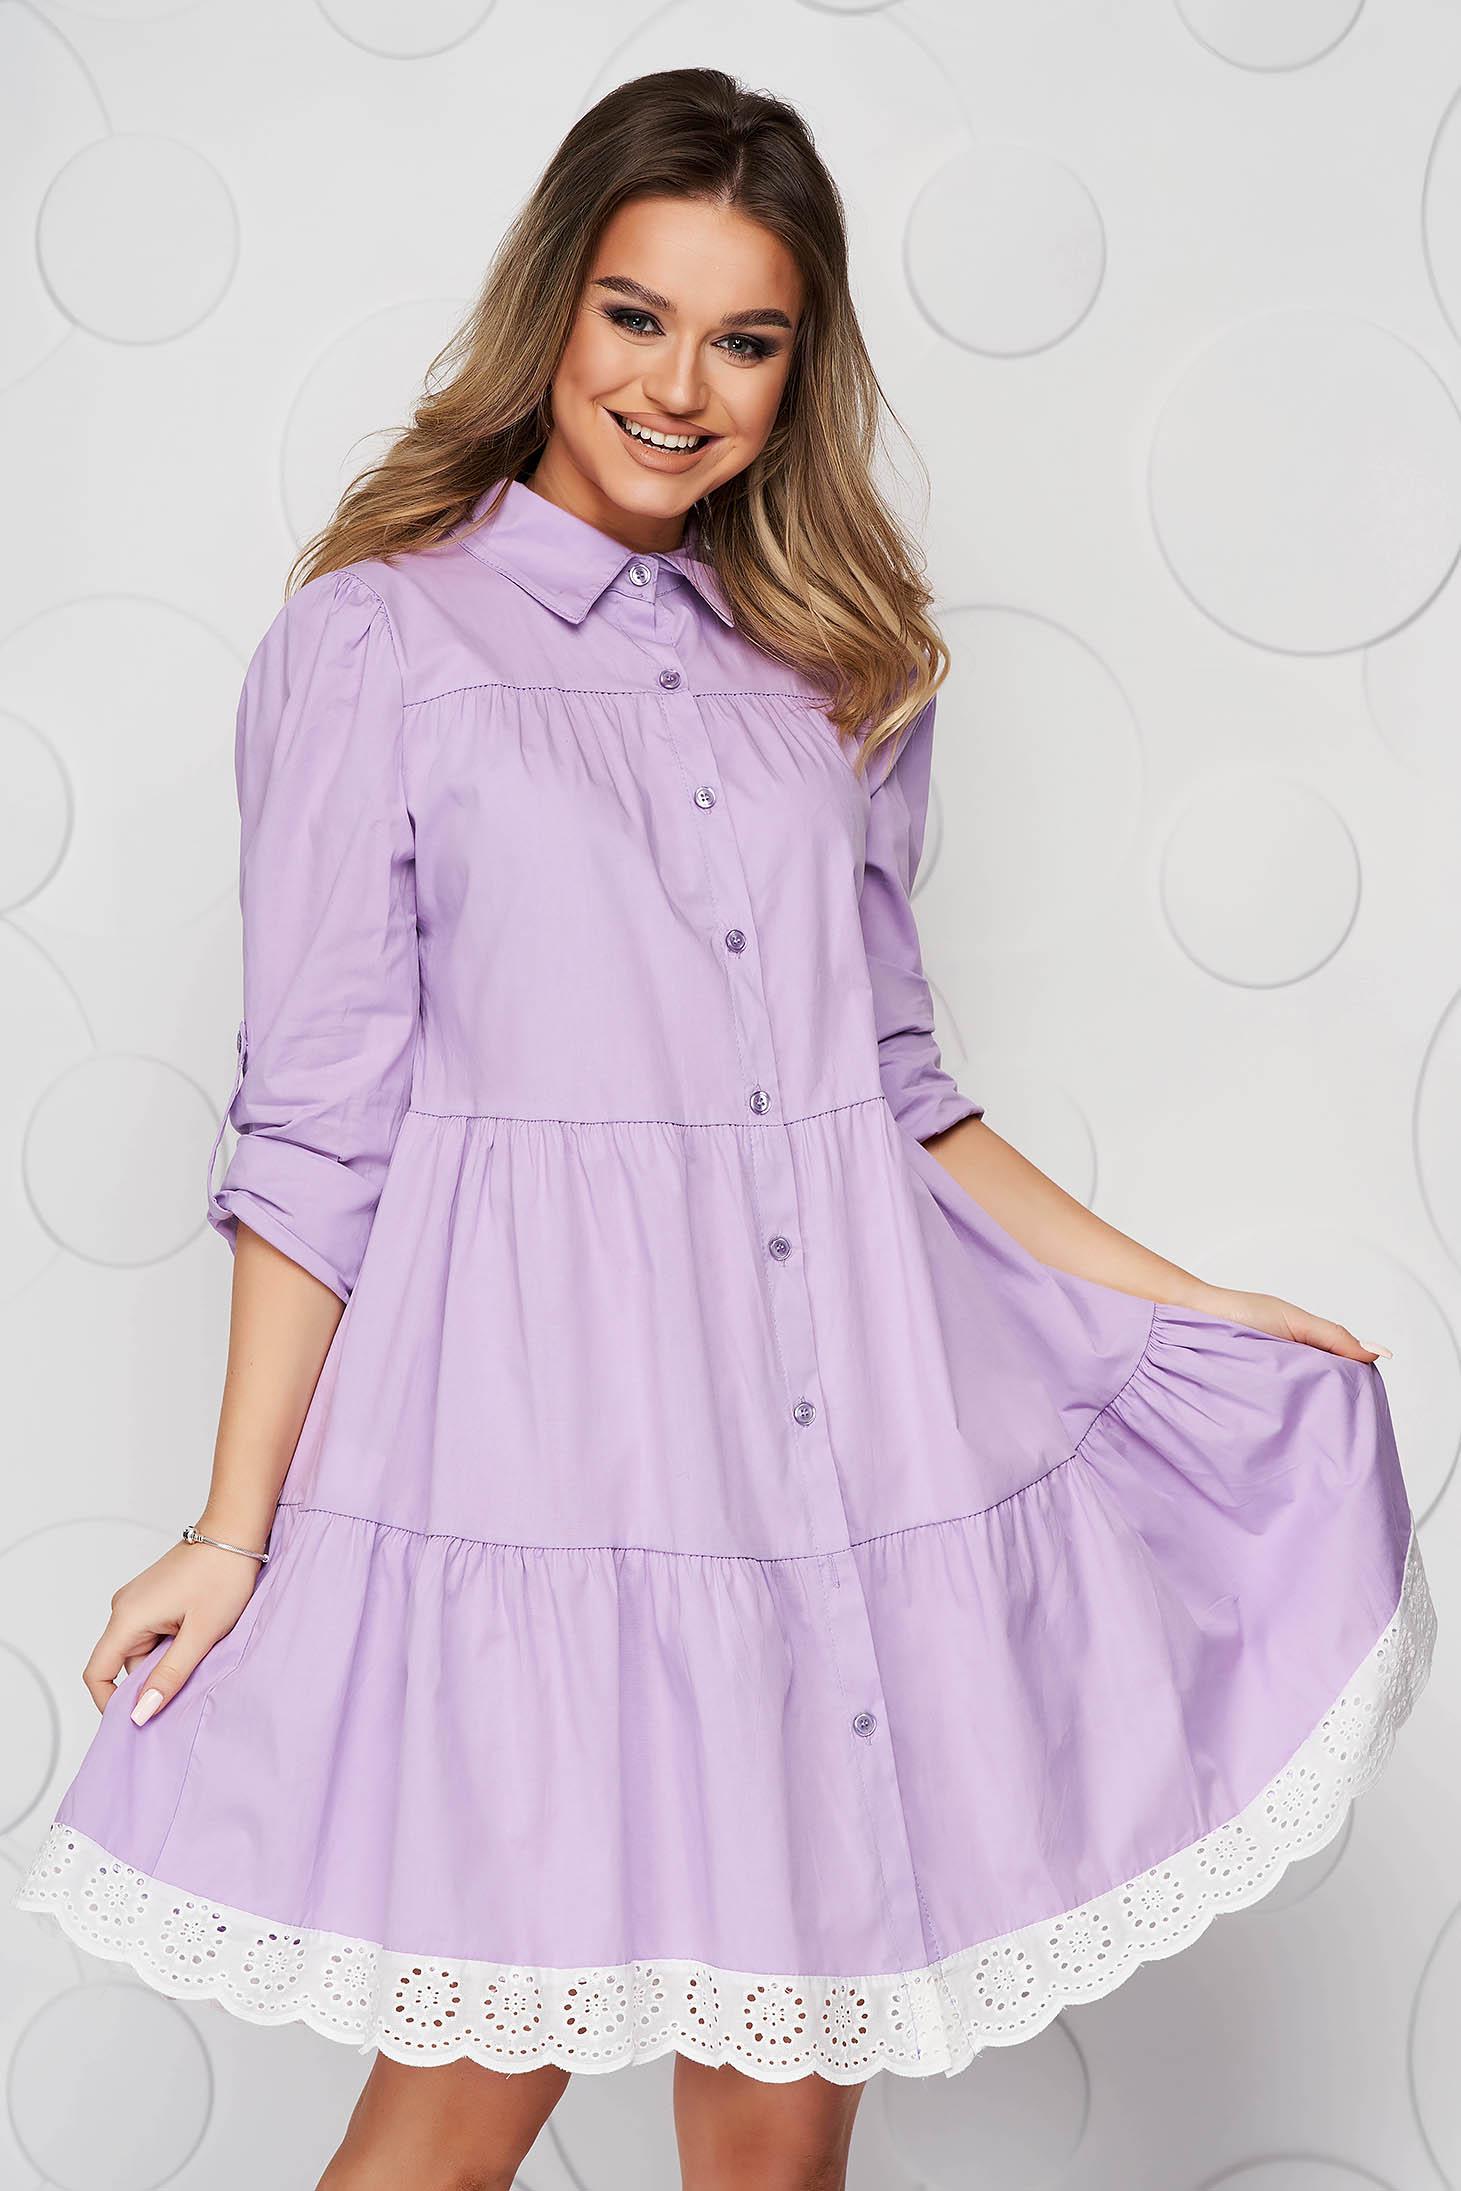 Lila dress cotton a-line with lace details midi